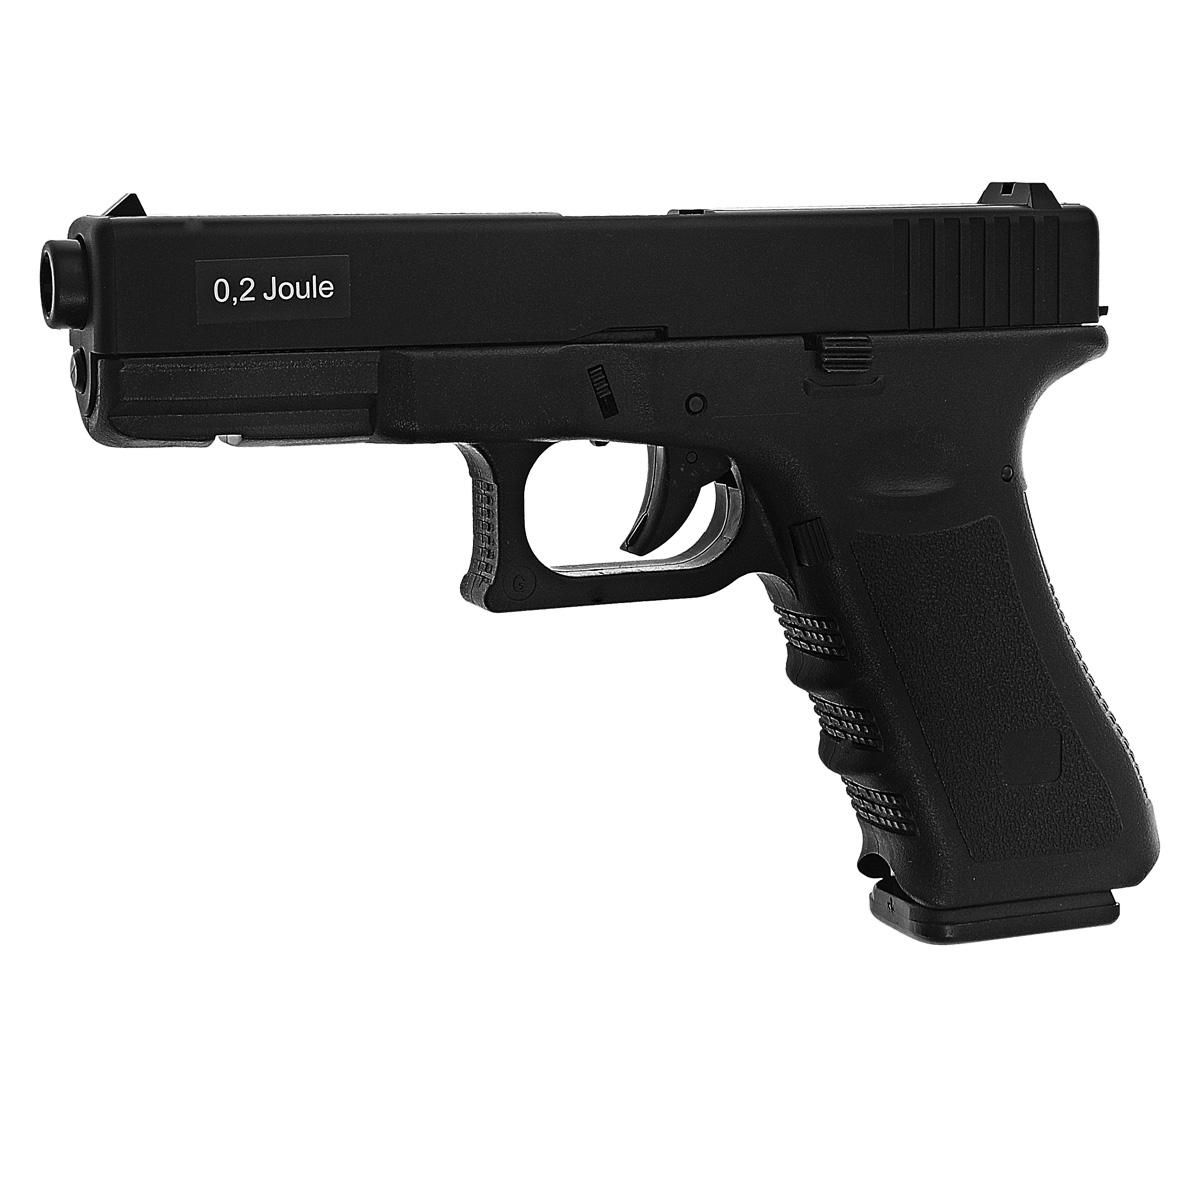 ASG G17 HW �������� �������������, spring, 6 �� (11110) - ASG11110������������� �������� G17 HW �� ������������ �������� � ������� ������������. ������ ������� �� ����������� ������ Glock 17. ������������ �� ������ ����������� ���������� � ������� ����� ���� - ���, ���, ��� - � ������� � ������������ �������. � ������� Weaver/Picatinny ��� ������� ��� ��������� ������ ��� �������. ����������� ������� ������� �������� ��������� ������. � ��������� ���� ��������� �������� ������� (����� 100 ��.). � ������������� ���-�� (���������� ���������� ��������� ������ ������). ����� ����� � 204 �� ����� ������: 90 �� ������ � 6 �� (���� ��� ����������) ������� ������� - 0,2 �� ������� ��������� 14 ������� 6 �� ������� �������� �� ABS-�������� ��� �������� - ��������� ���������� (������� ������ ����������� ����� ������� ��������) ��������� ����������, ��� ������������� ���������� ���������� ������� ������������: ������� � ����������� ��������� � ������ ����������� ��� �����, �� ����������� ��...